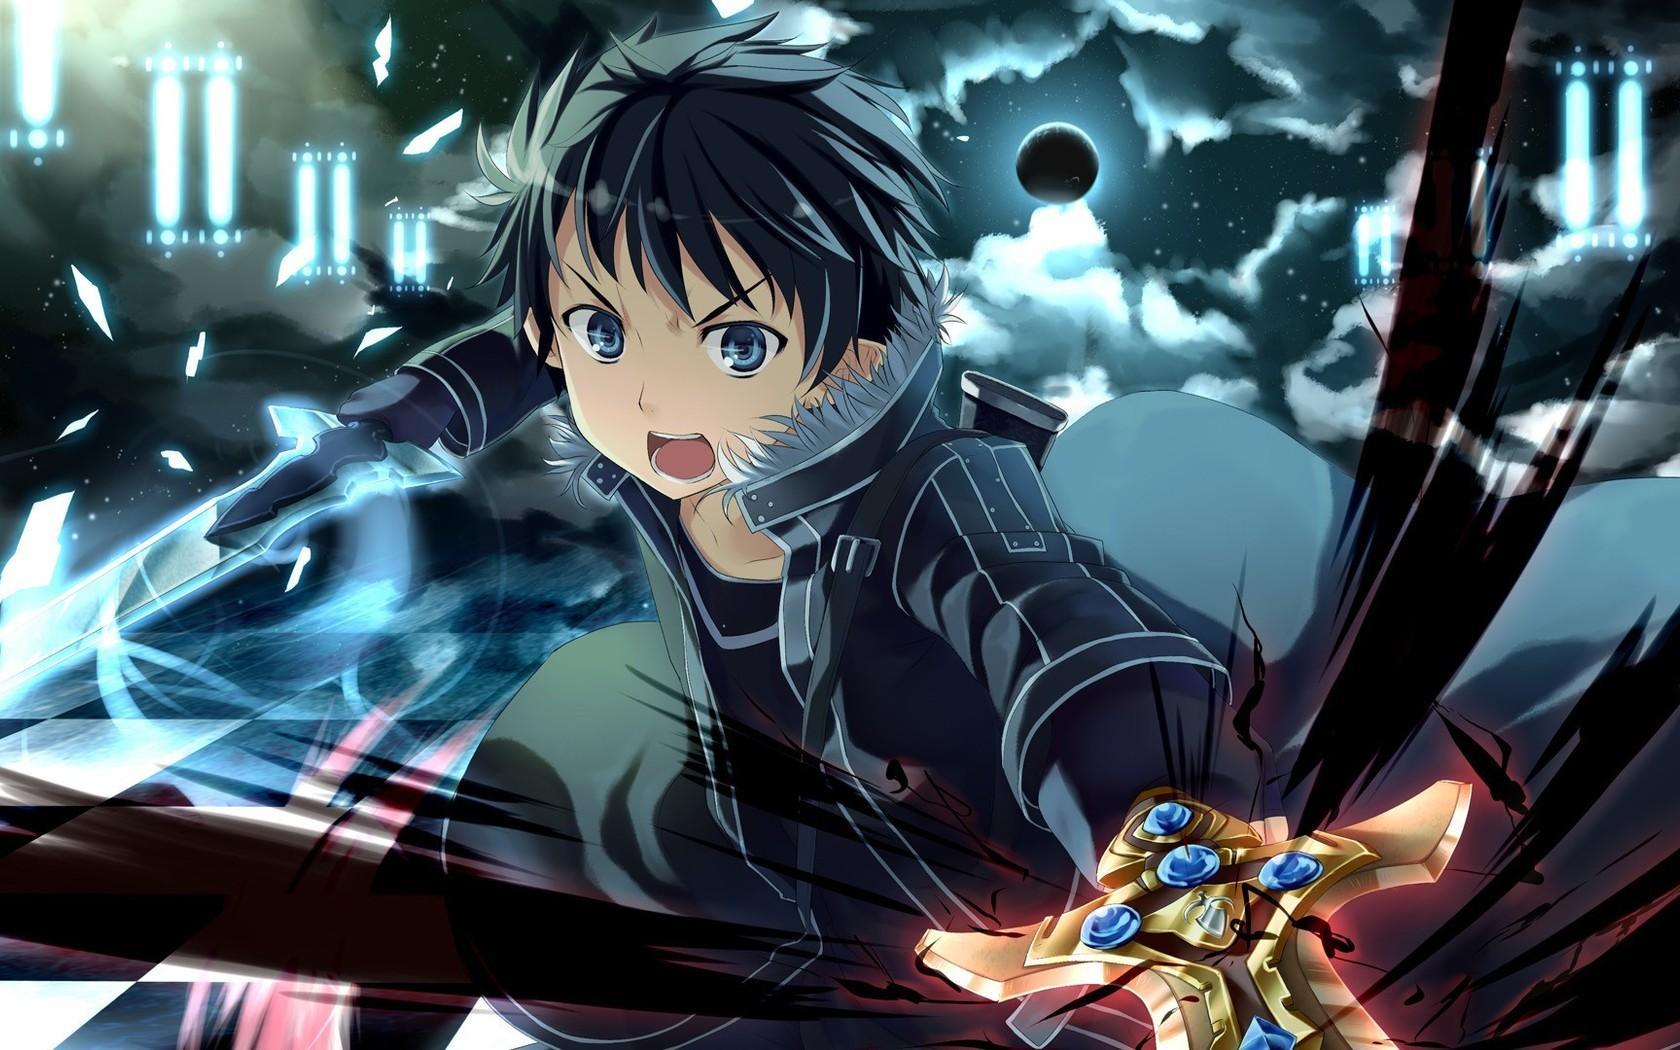 Download Kirito   Sword Art Online wallpaper 1680x1050